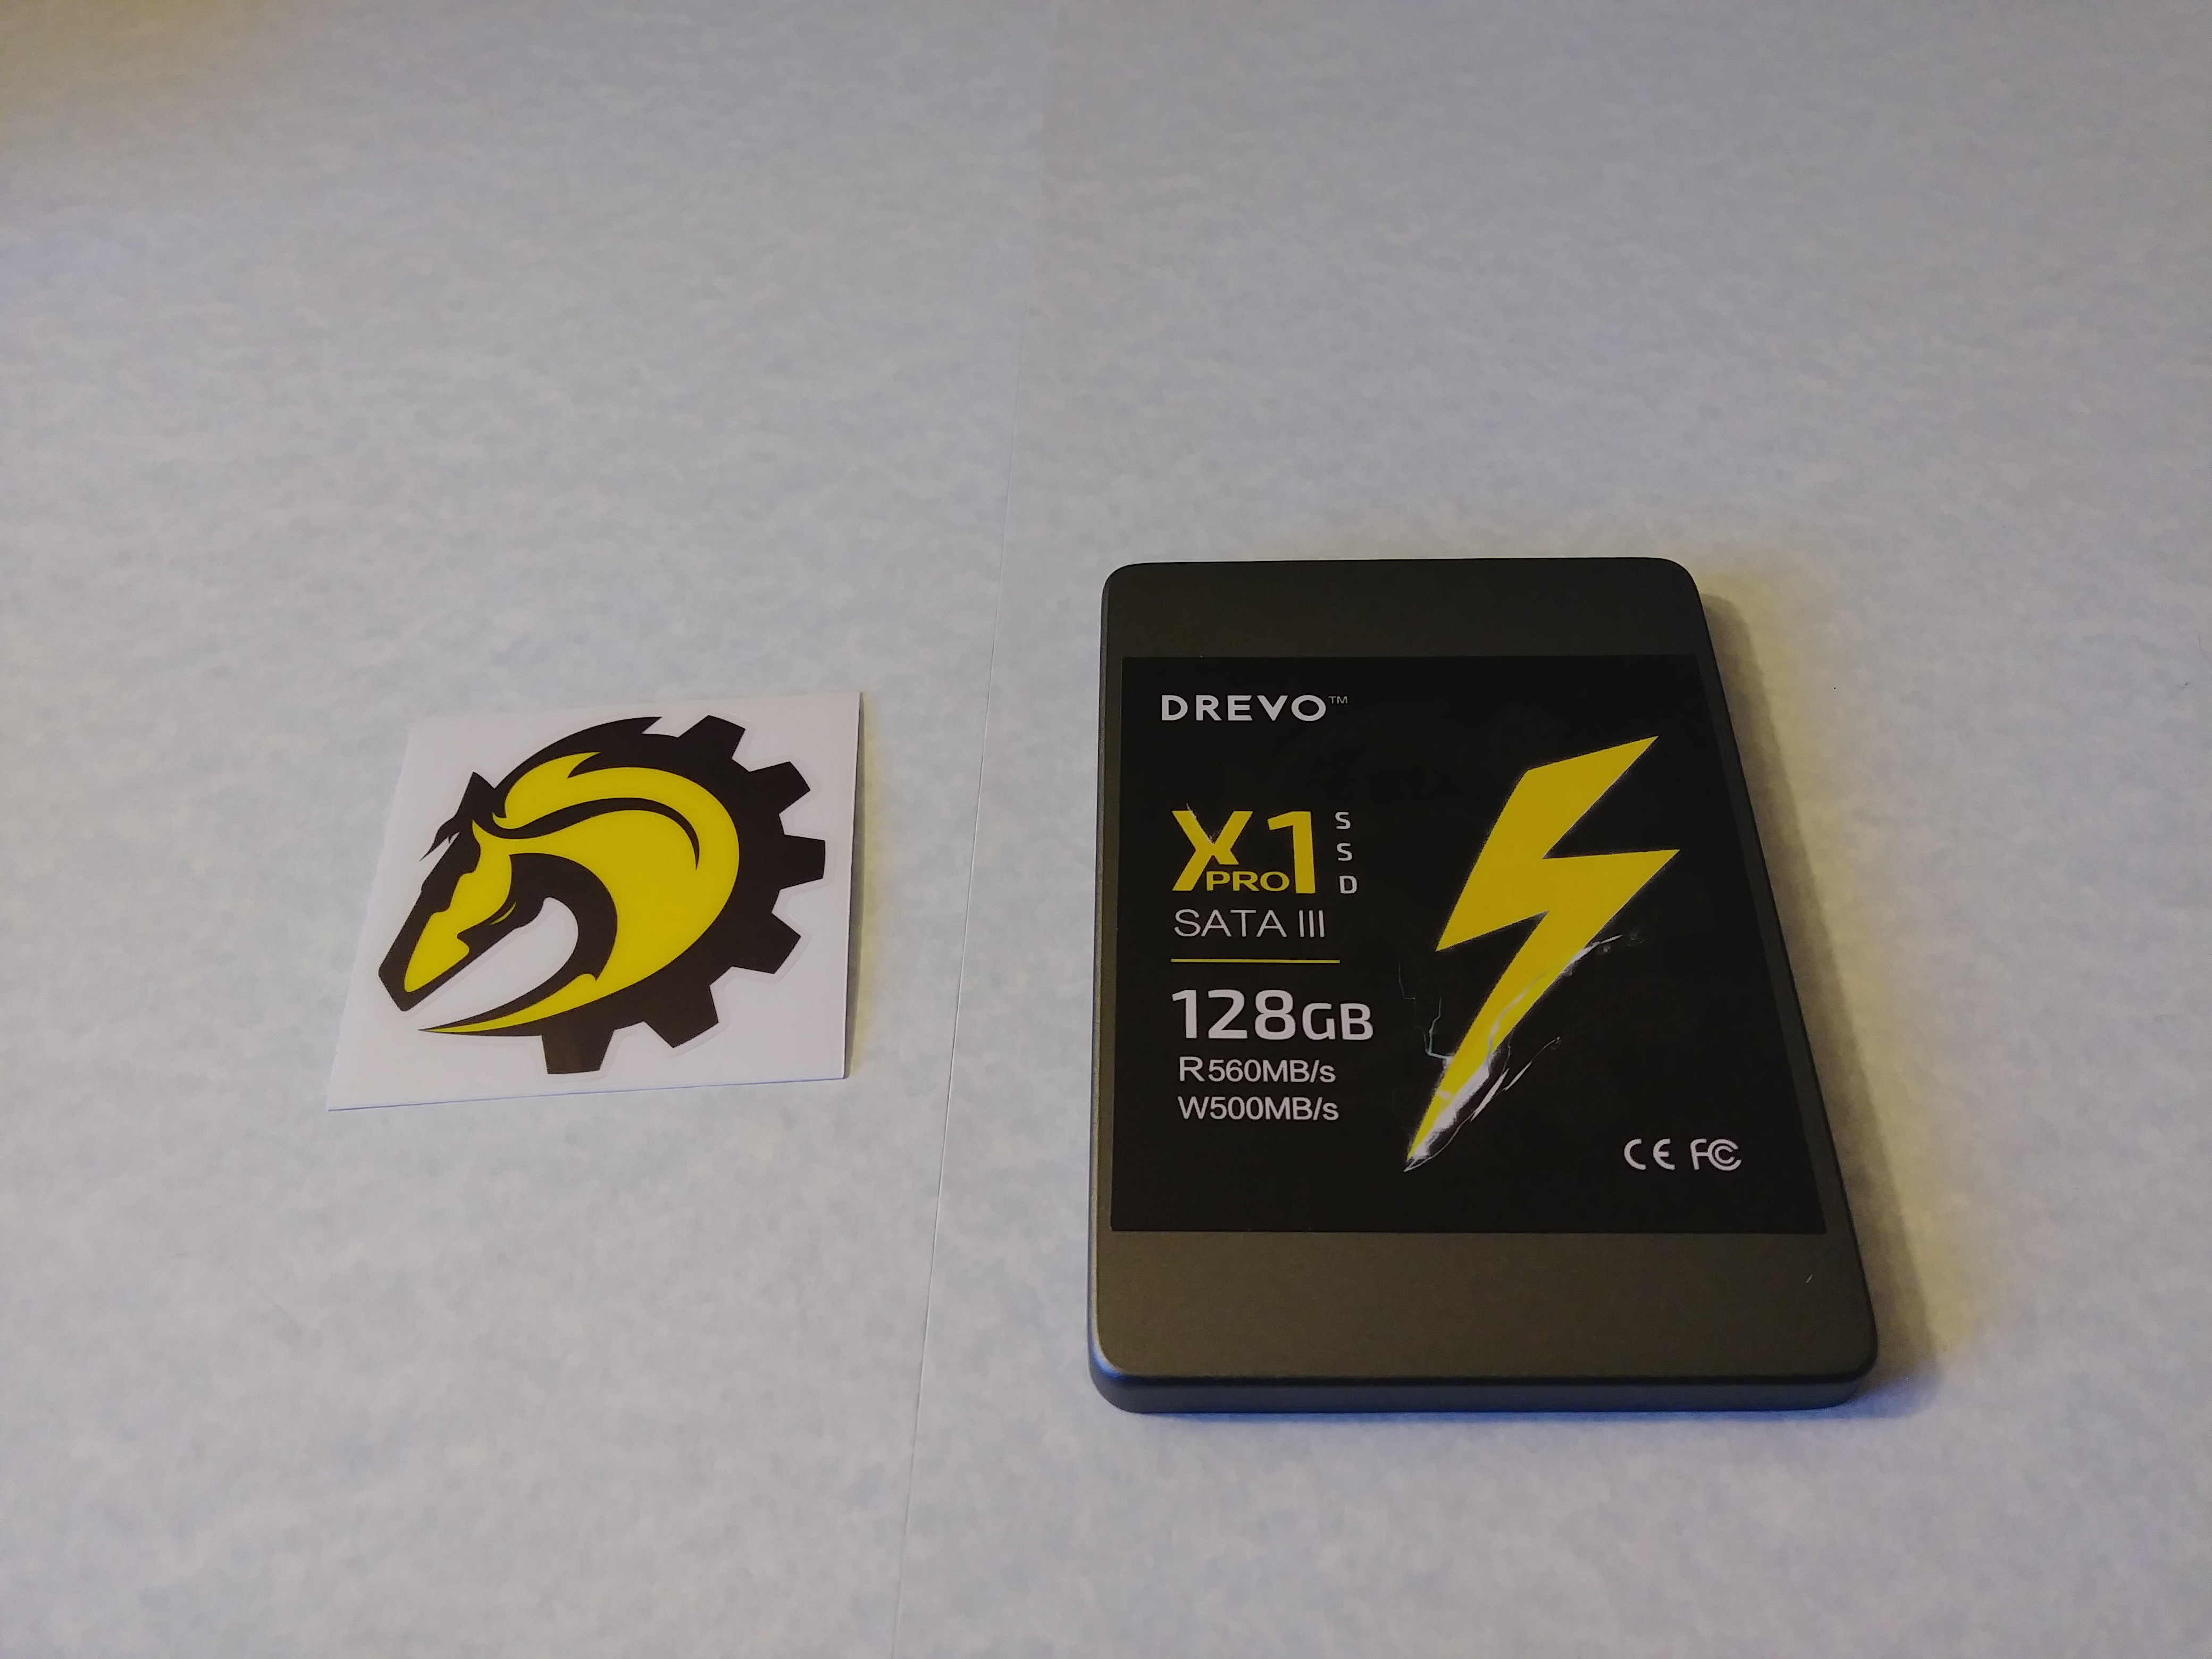 DREVO X1 Pro 128GB SSD Review